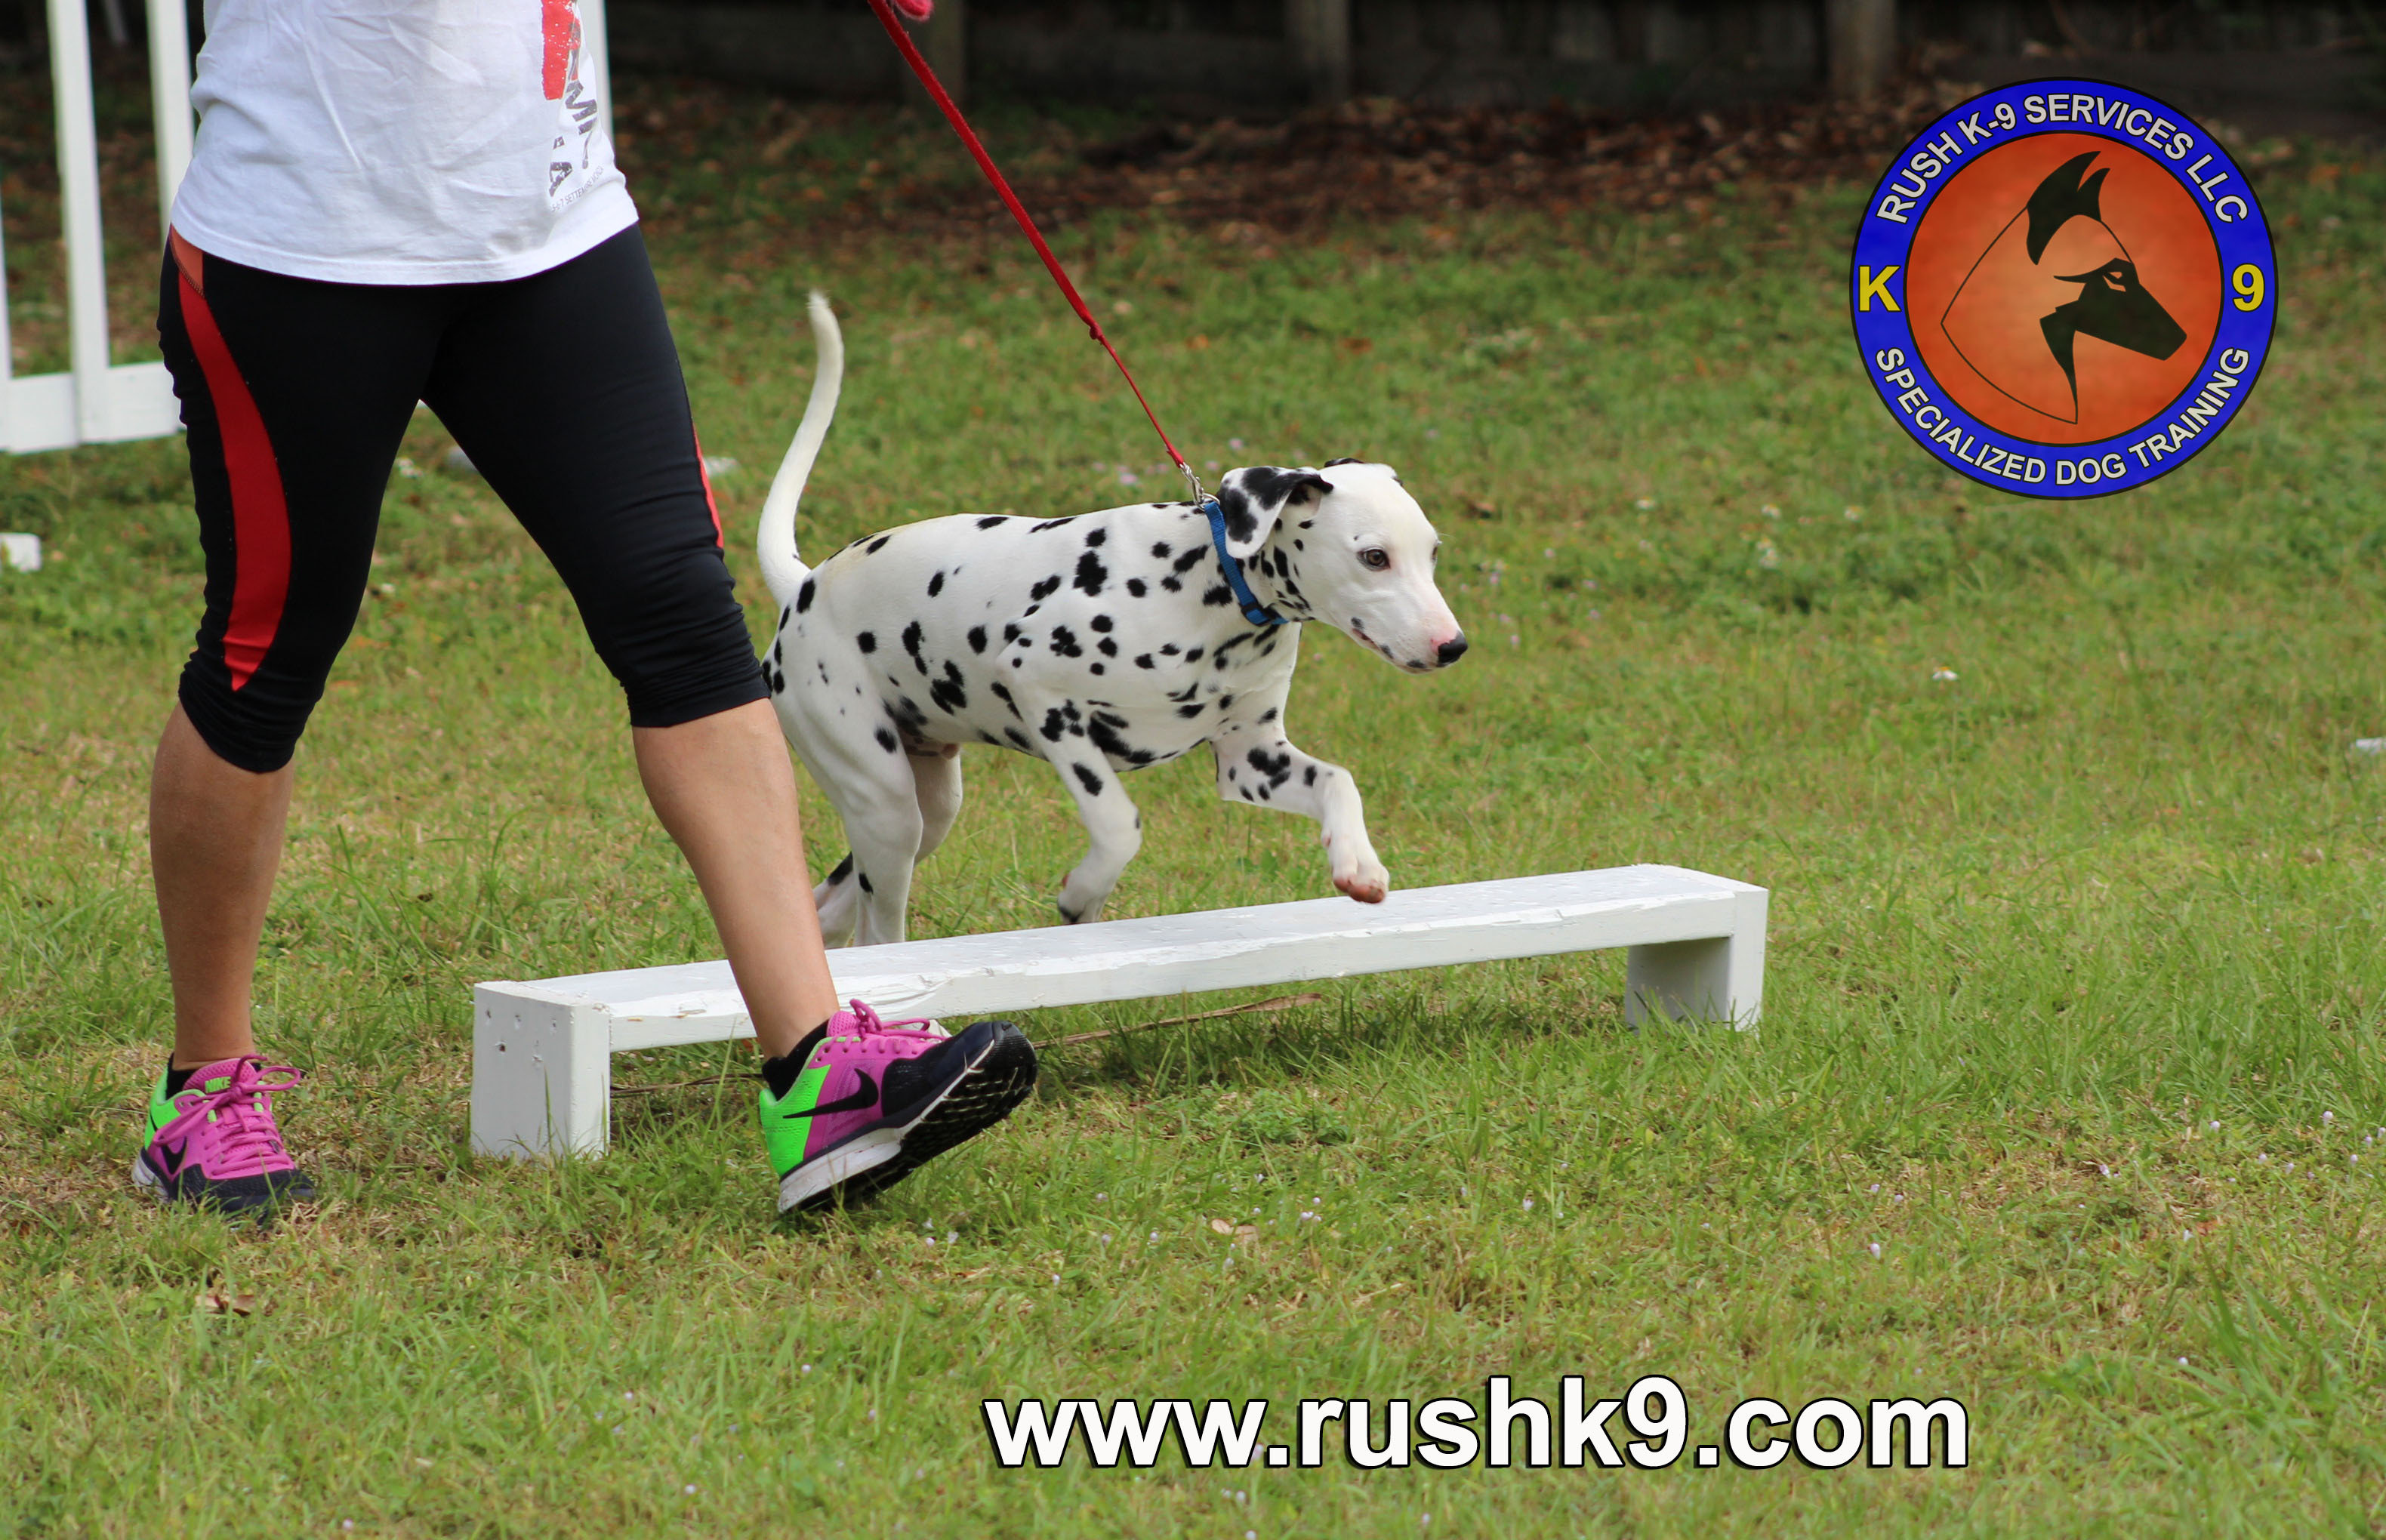 rush k9 services (85)